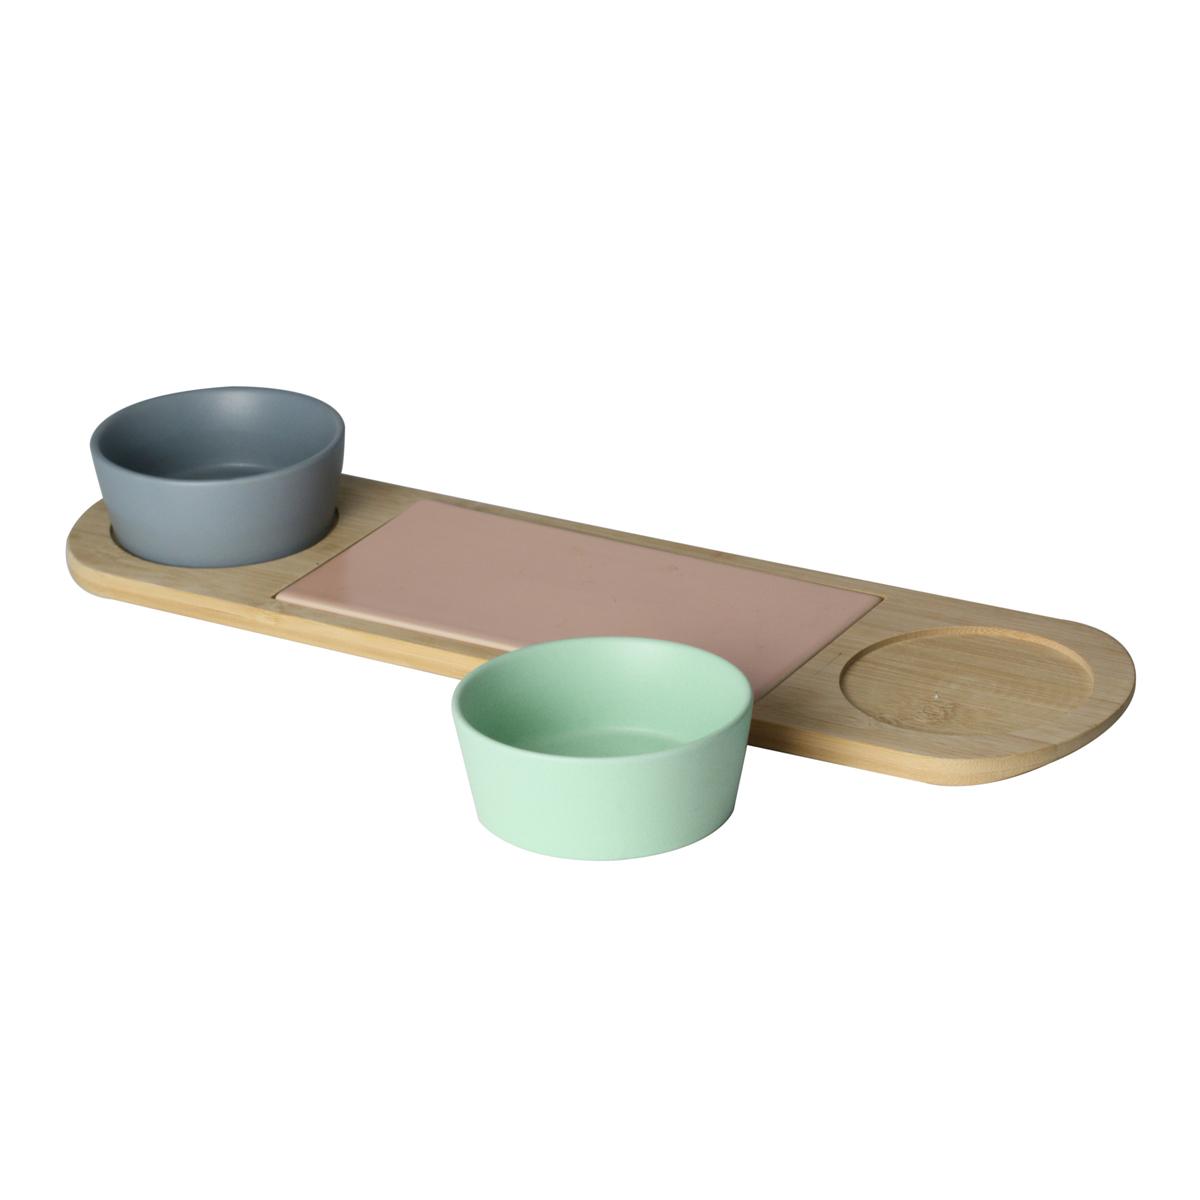 Petisqueira De Bambu C/ 2 Potes E 1 Bandeja De Cerâmica Lyor